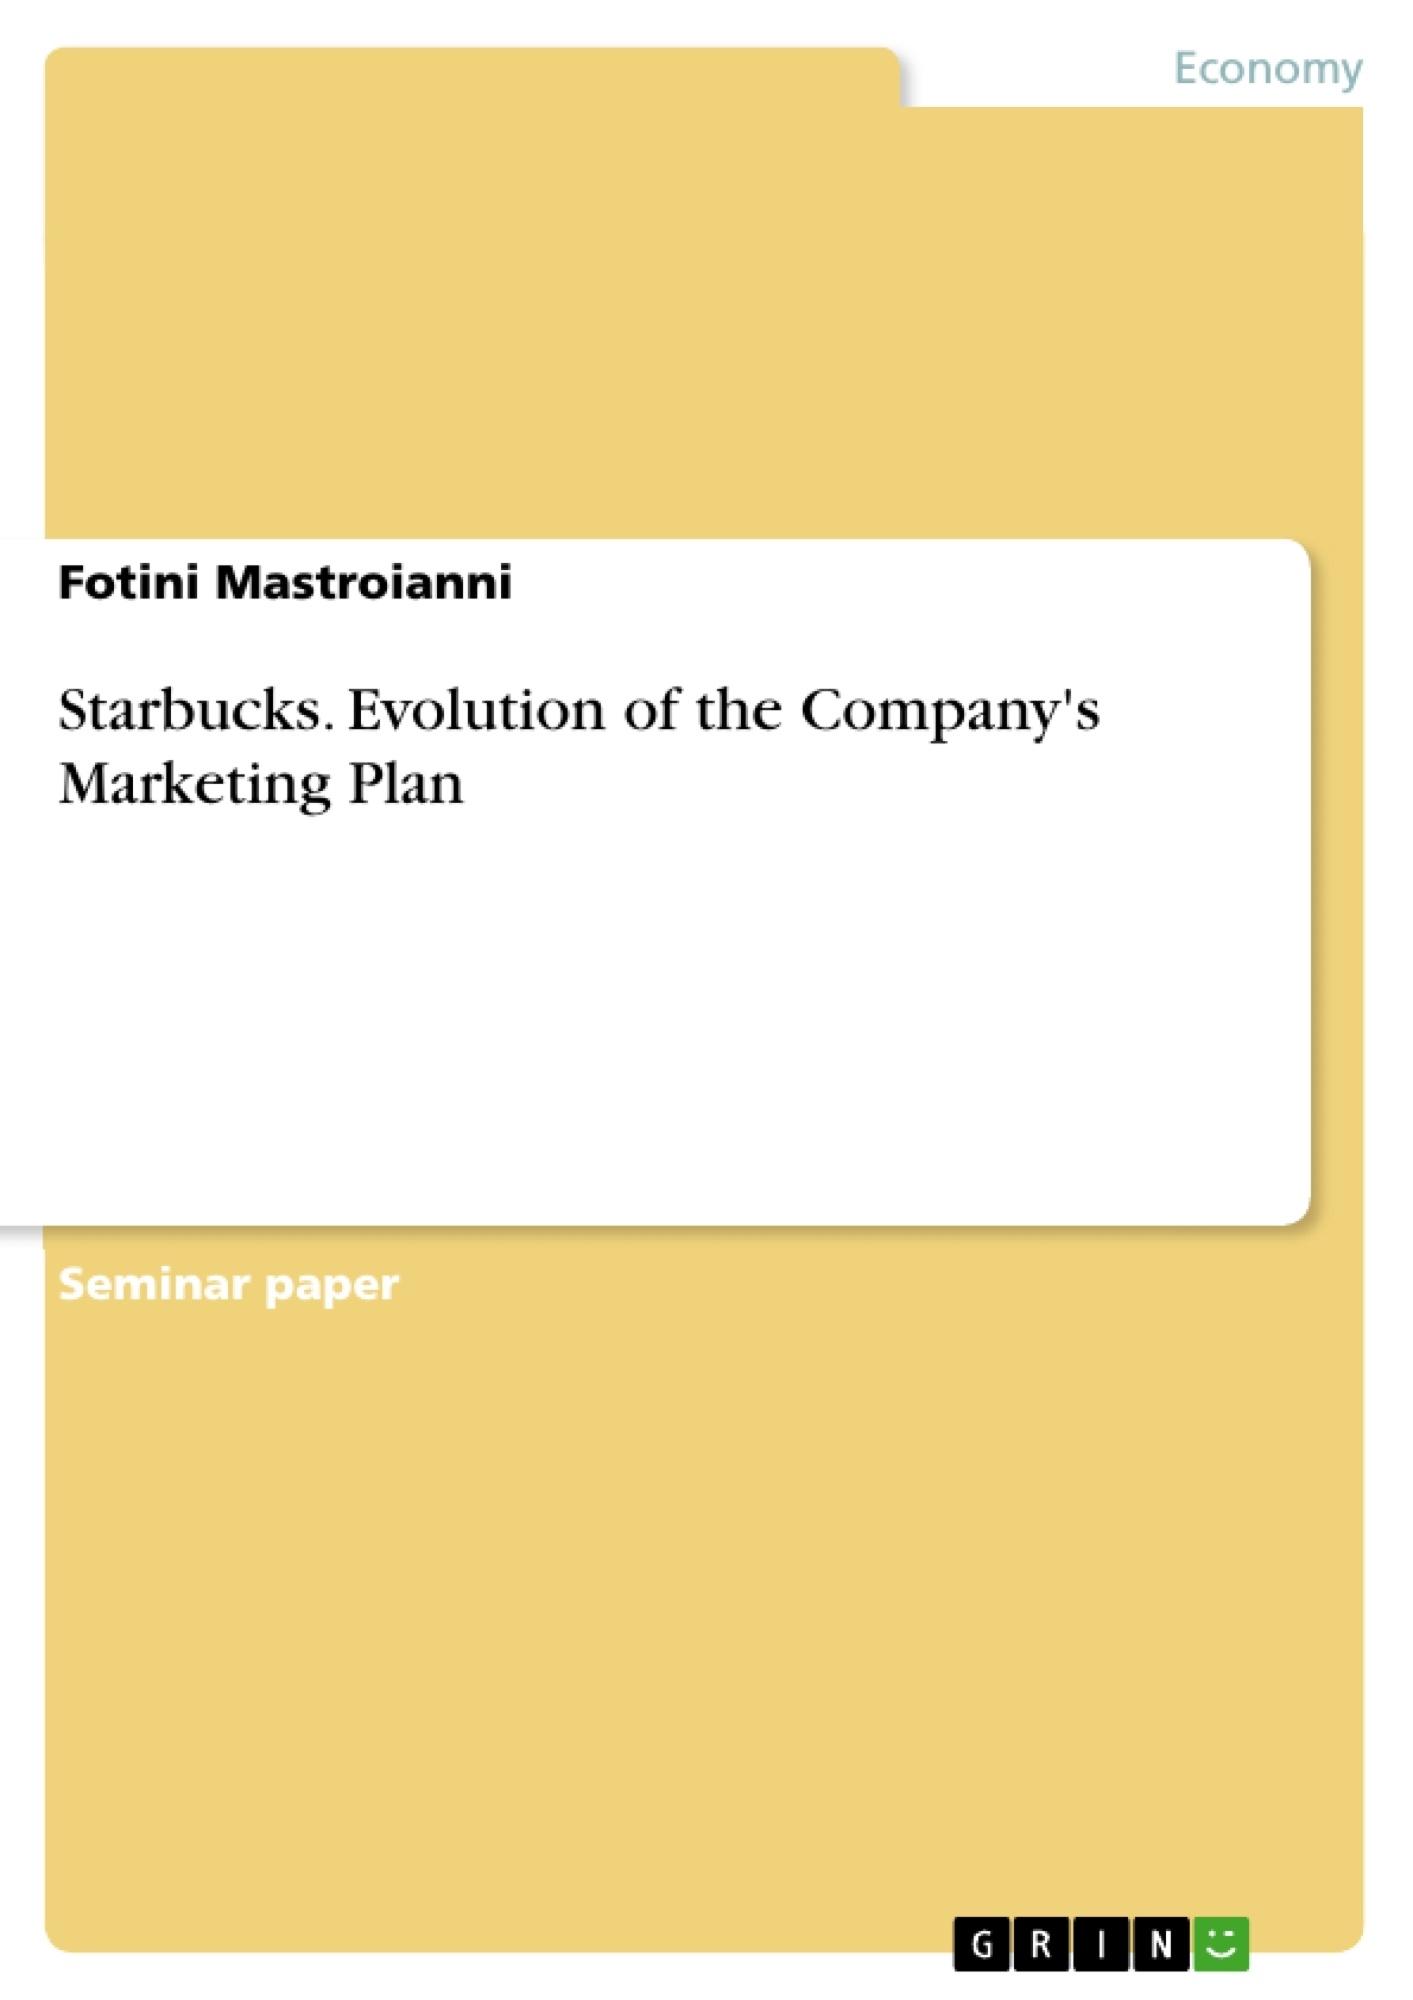 Title: Starbucks. Evolution of the Company's Marketing Plan